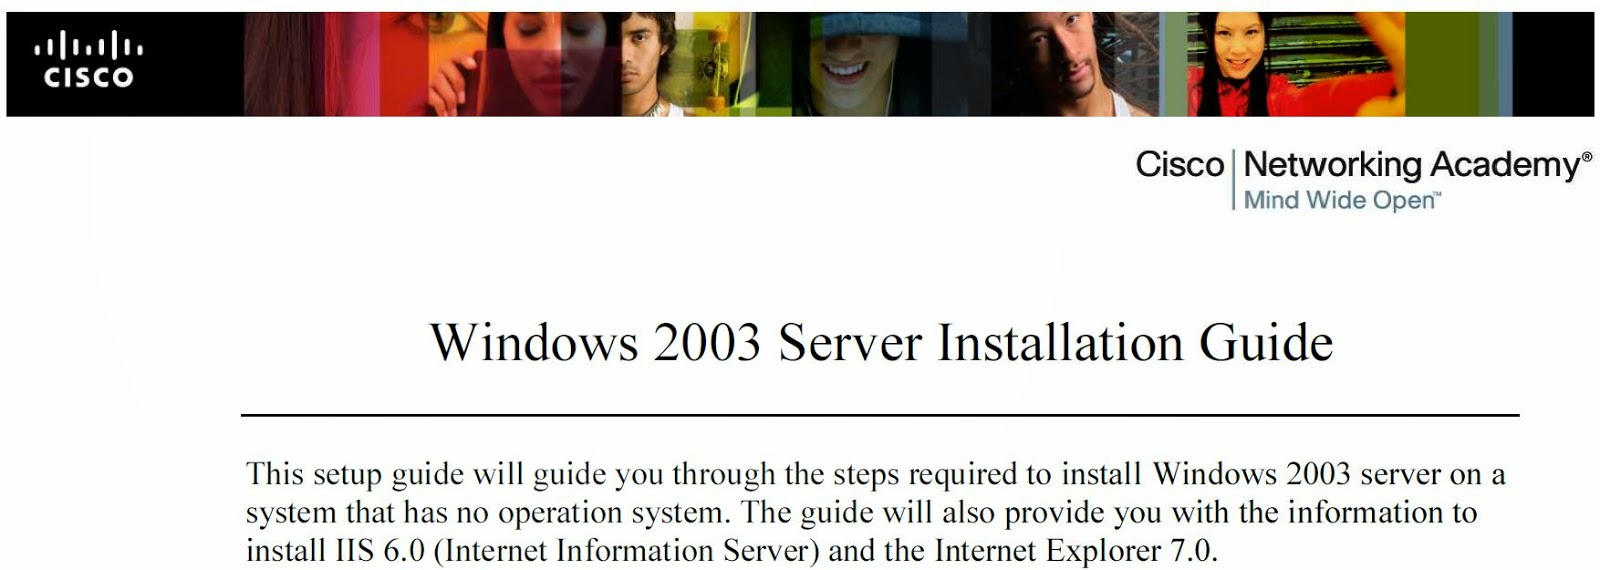 Windows 2003 Server Installation Guide